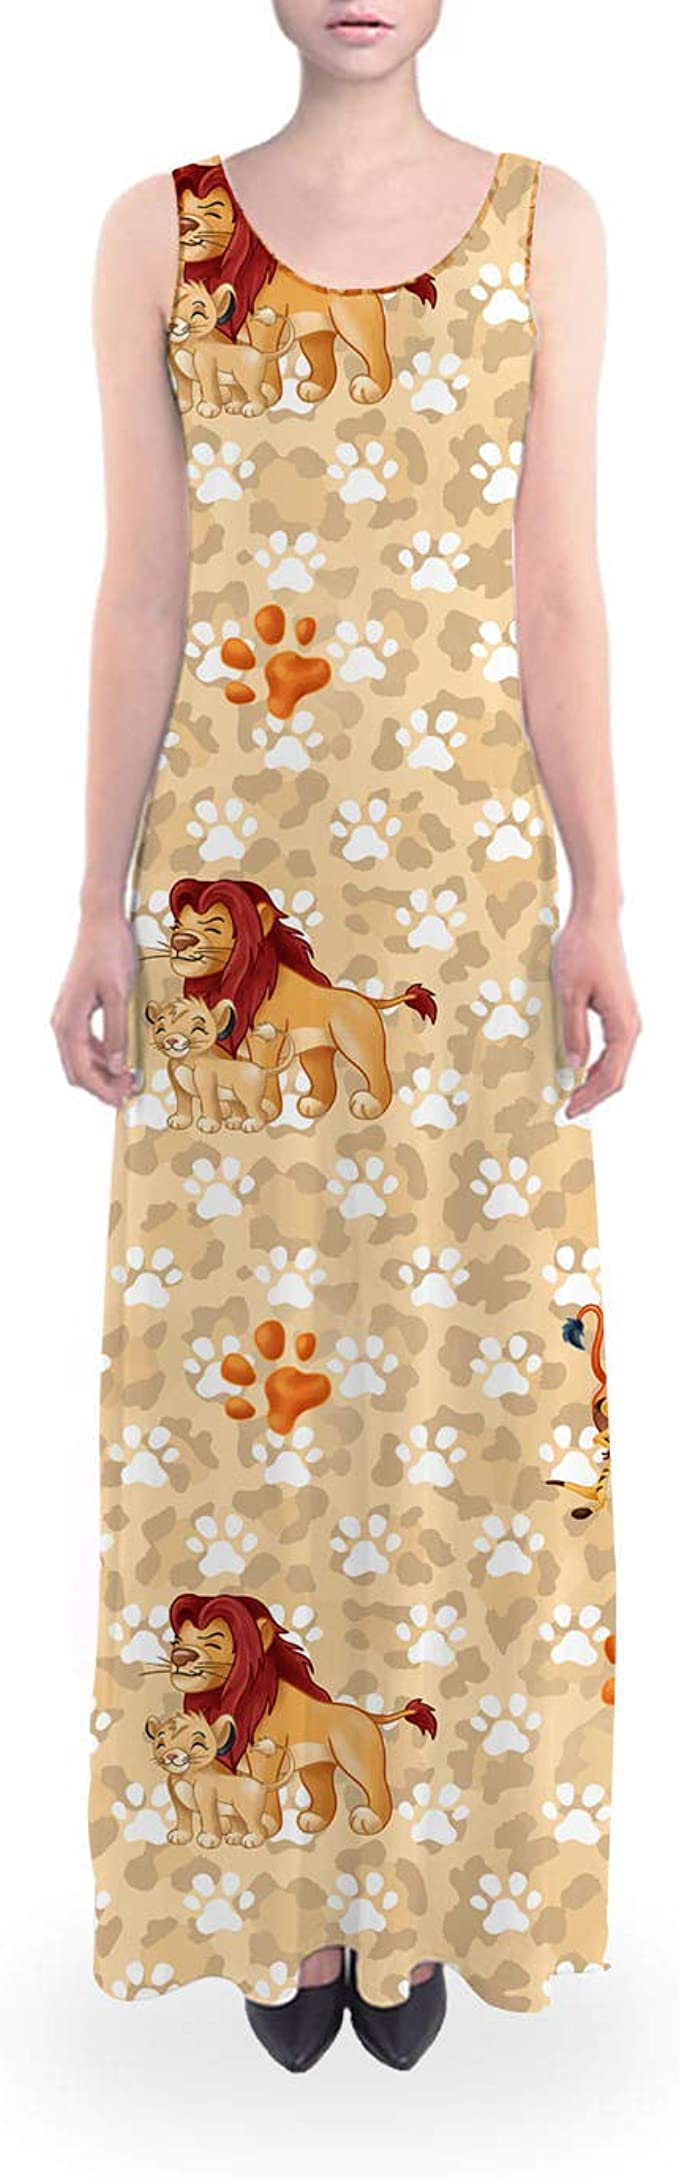 lion king tunic disney safari dress lion king lion king outfit Lion king dress lion king birthday hakuna matata dress lion king shirt